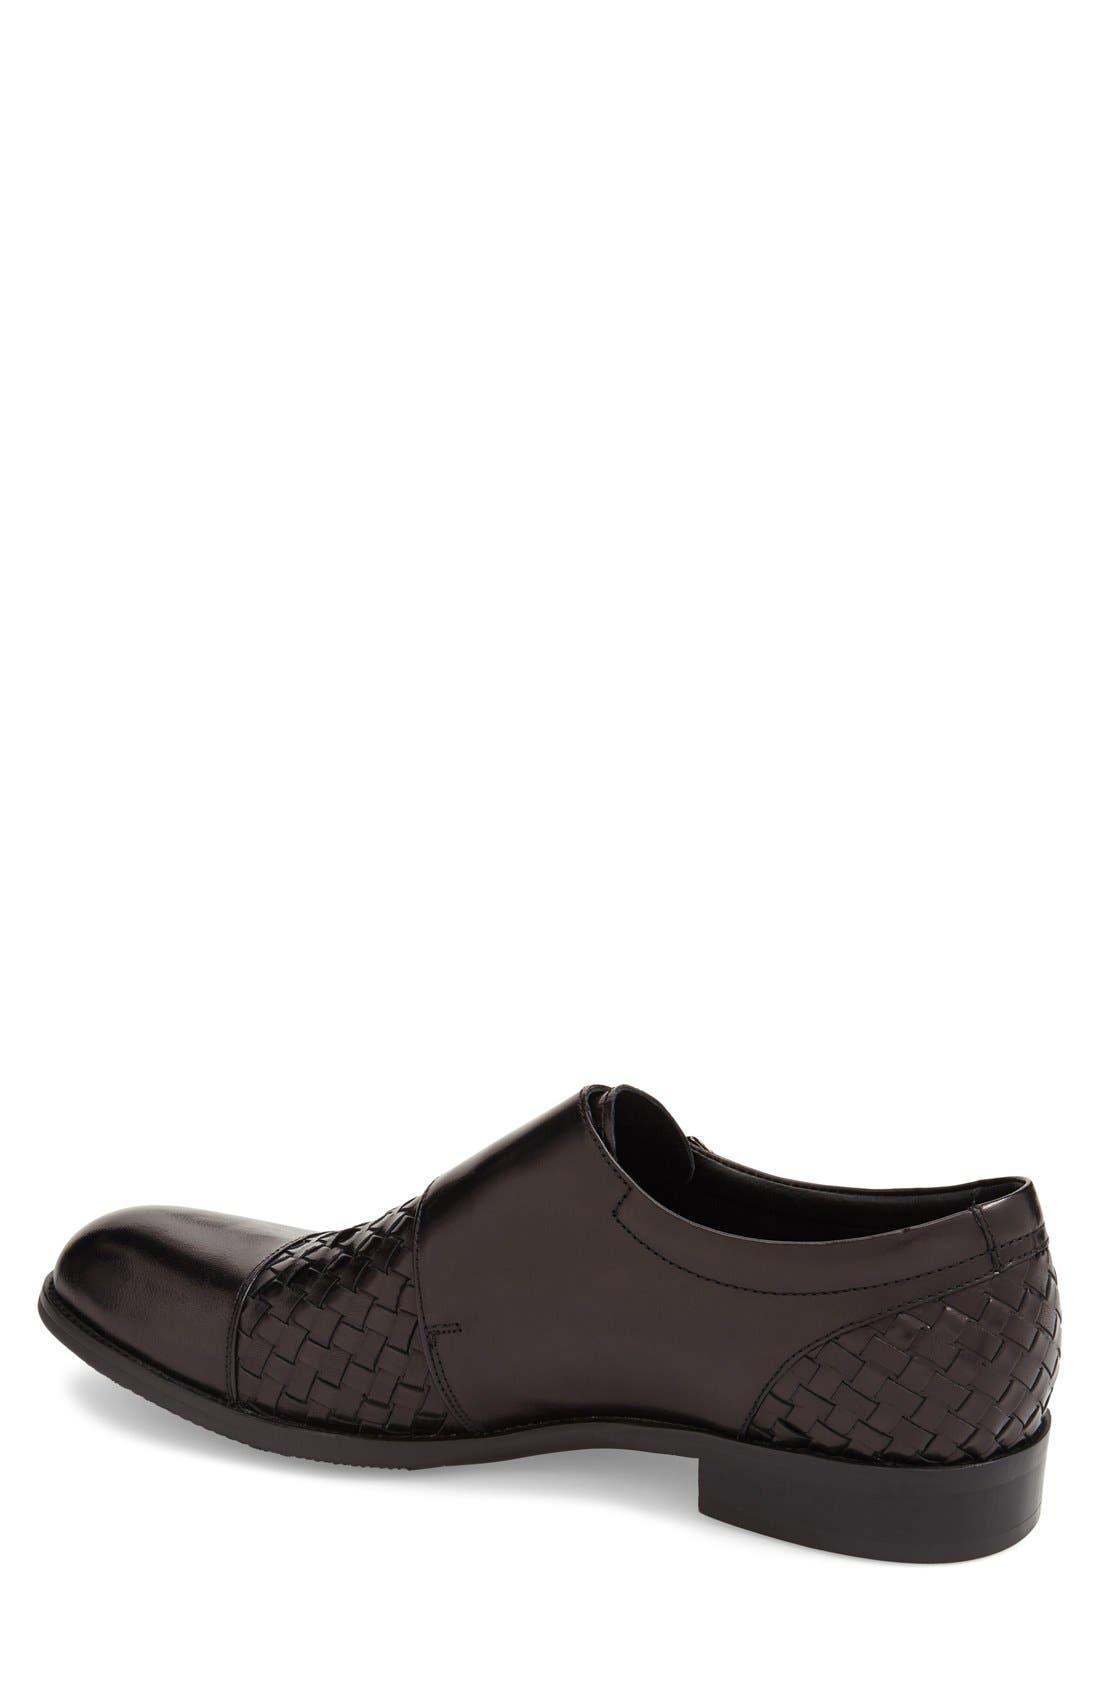 'Mahler' Monk Strap Shoe,                             Alternate thumbnail 2, color,                             Black Leather